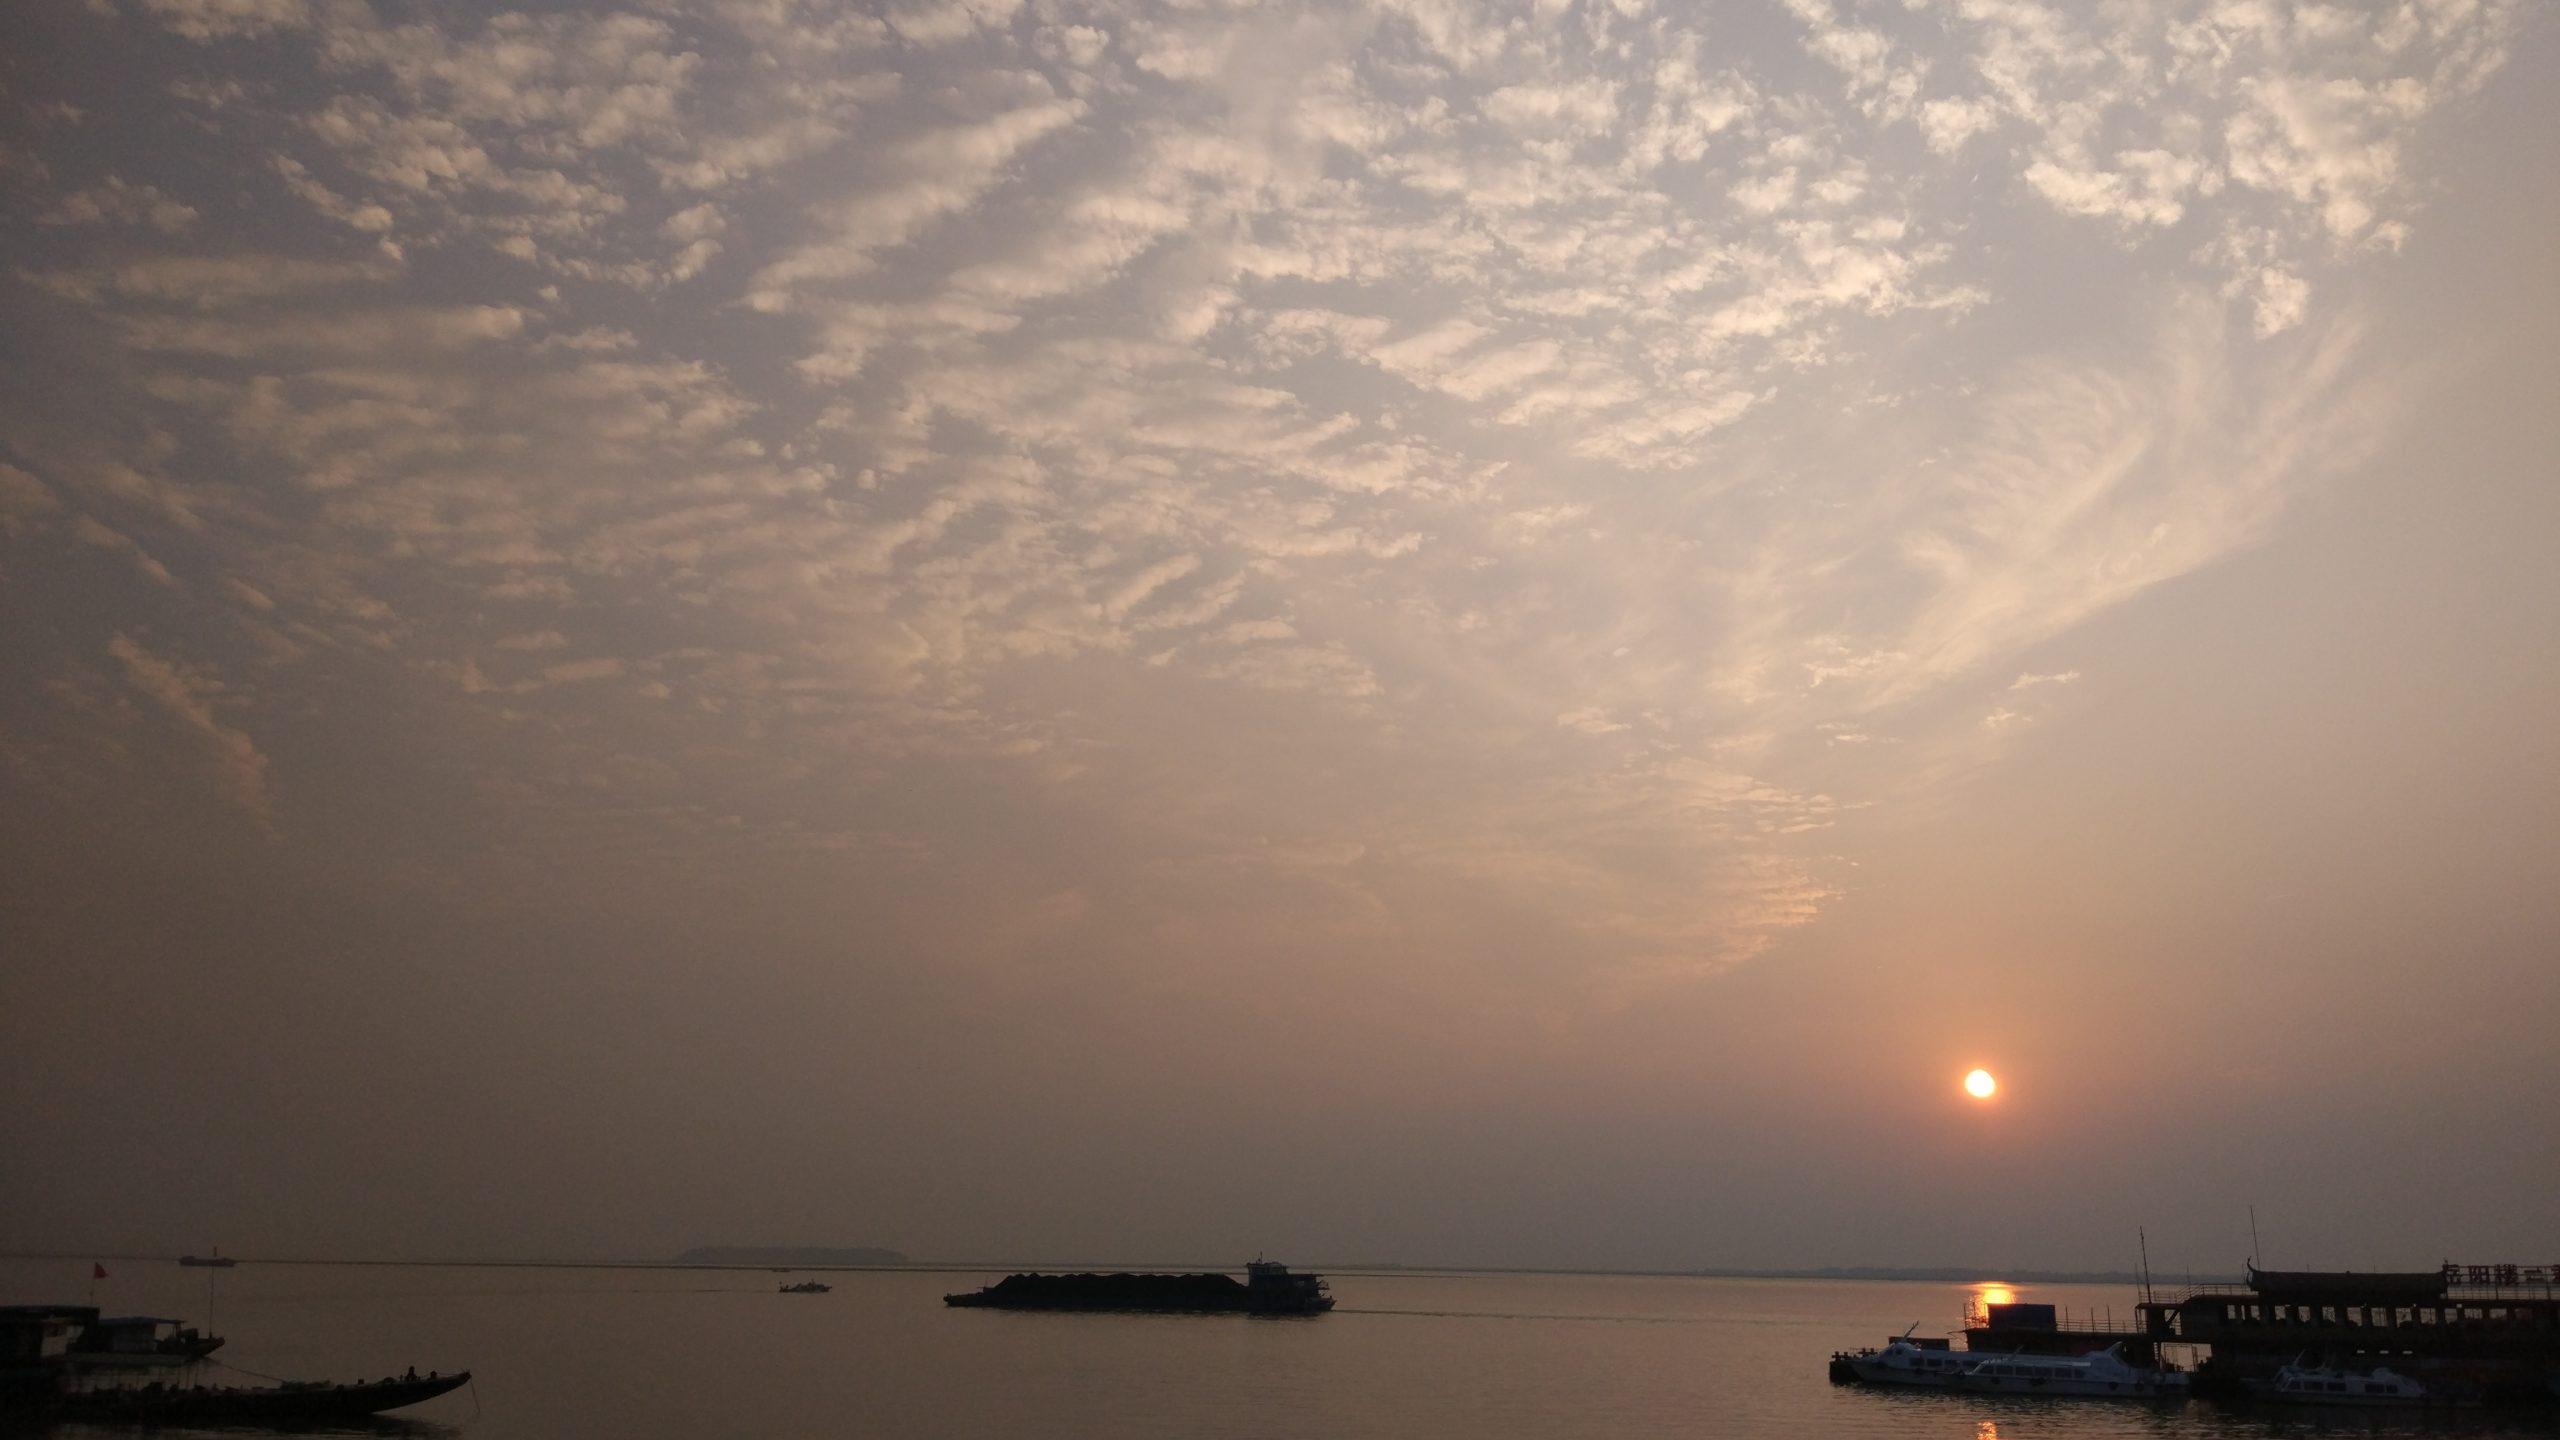 China: Excede nivel de agua garantizada de lago de agua dulce en provincia central de China (Xinhuanet)